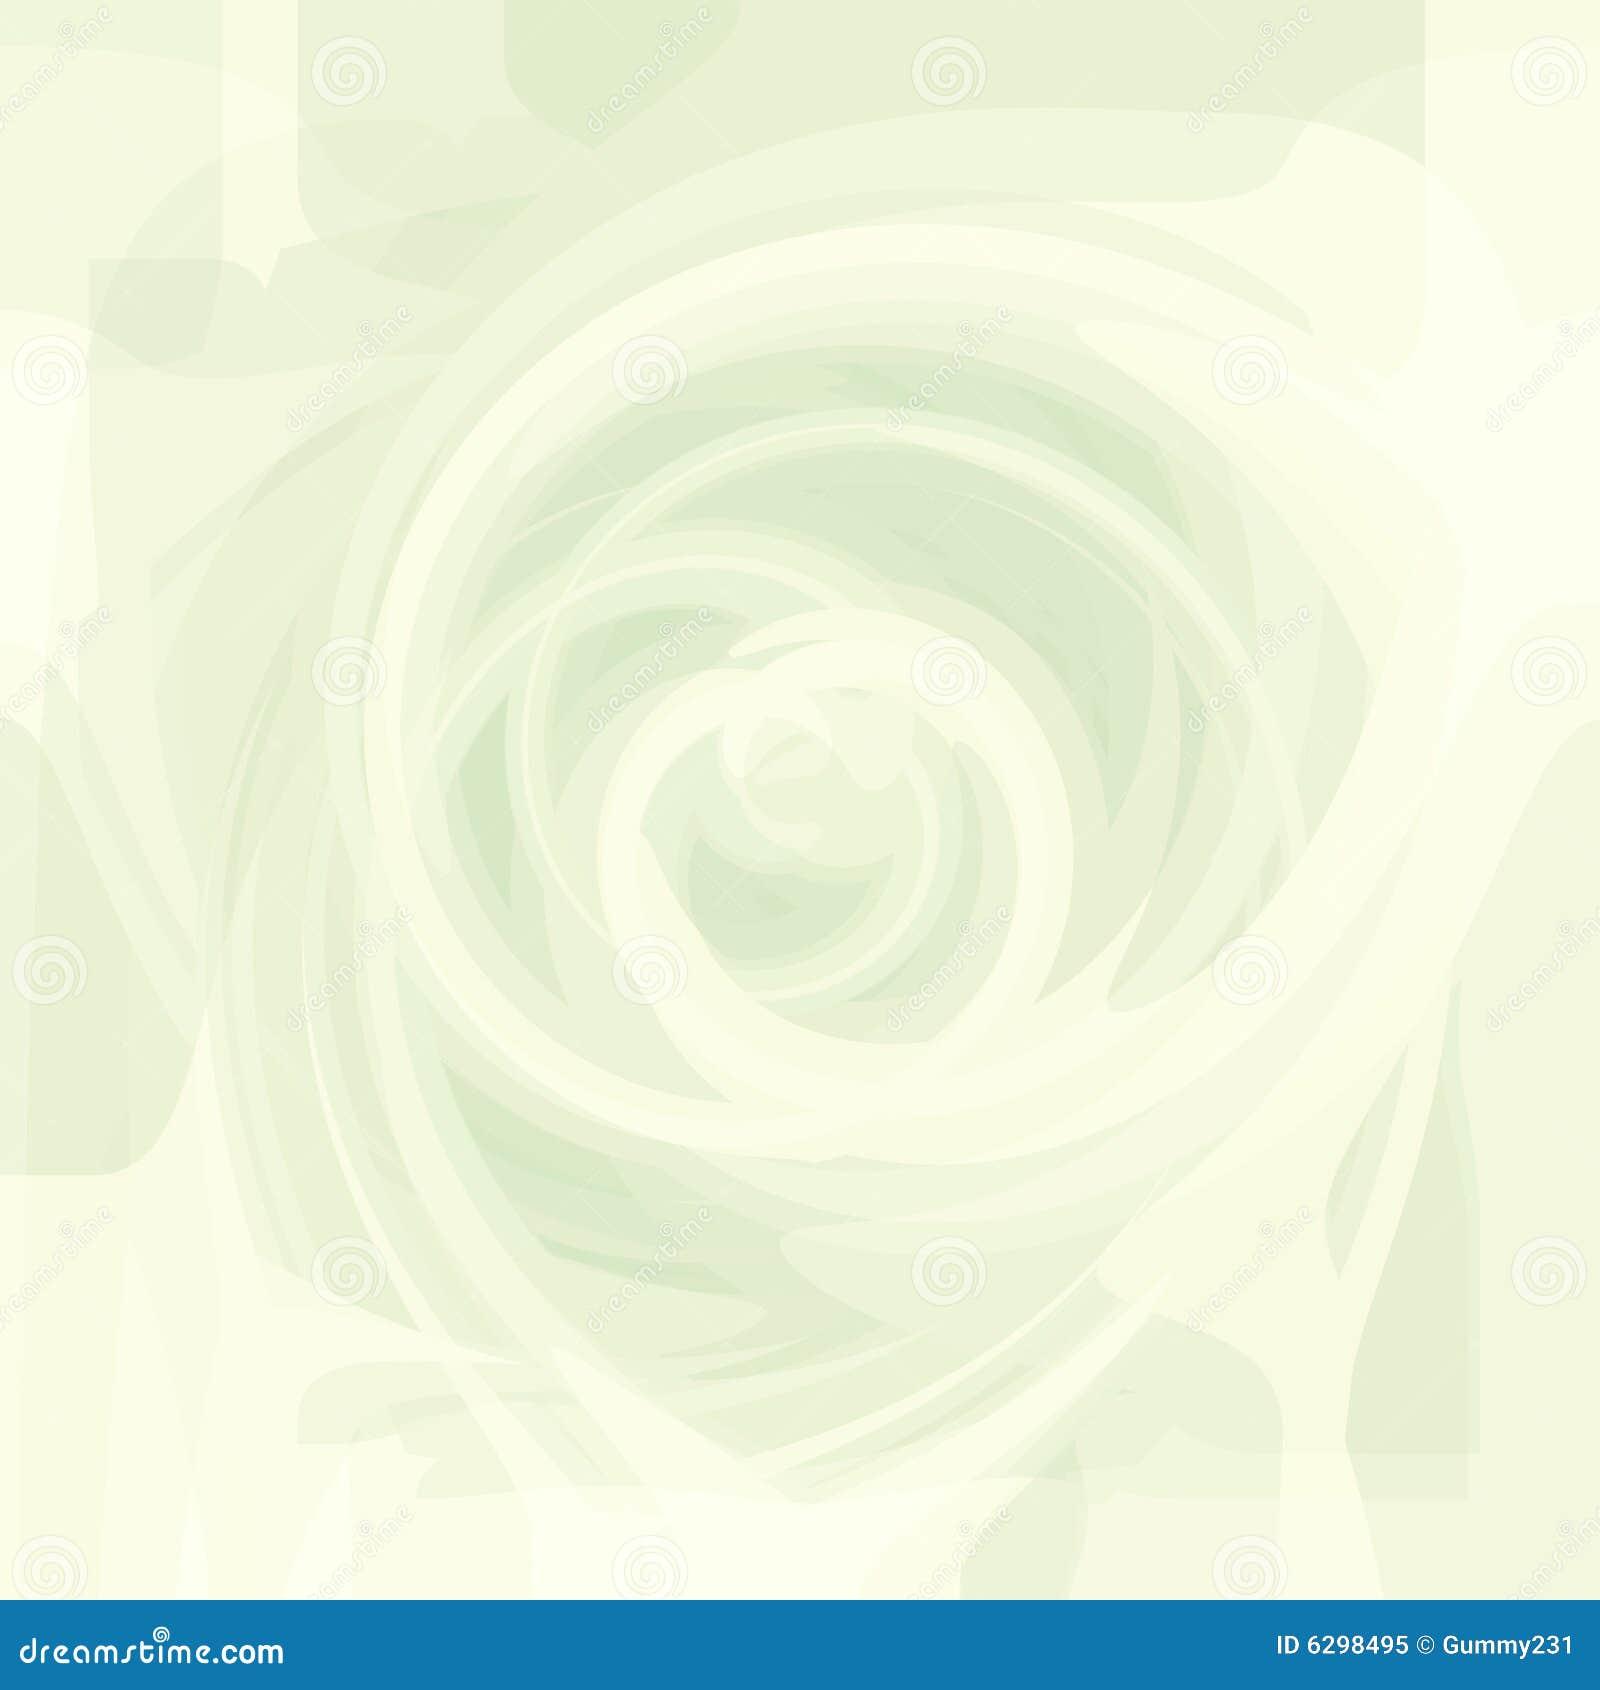 Cream Background Stock Illustration. Illustration Of Blank